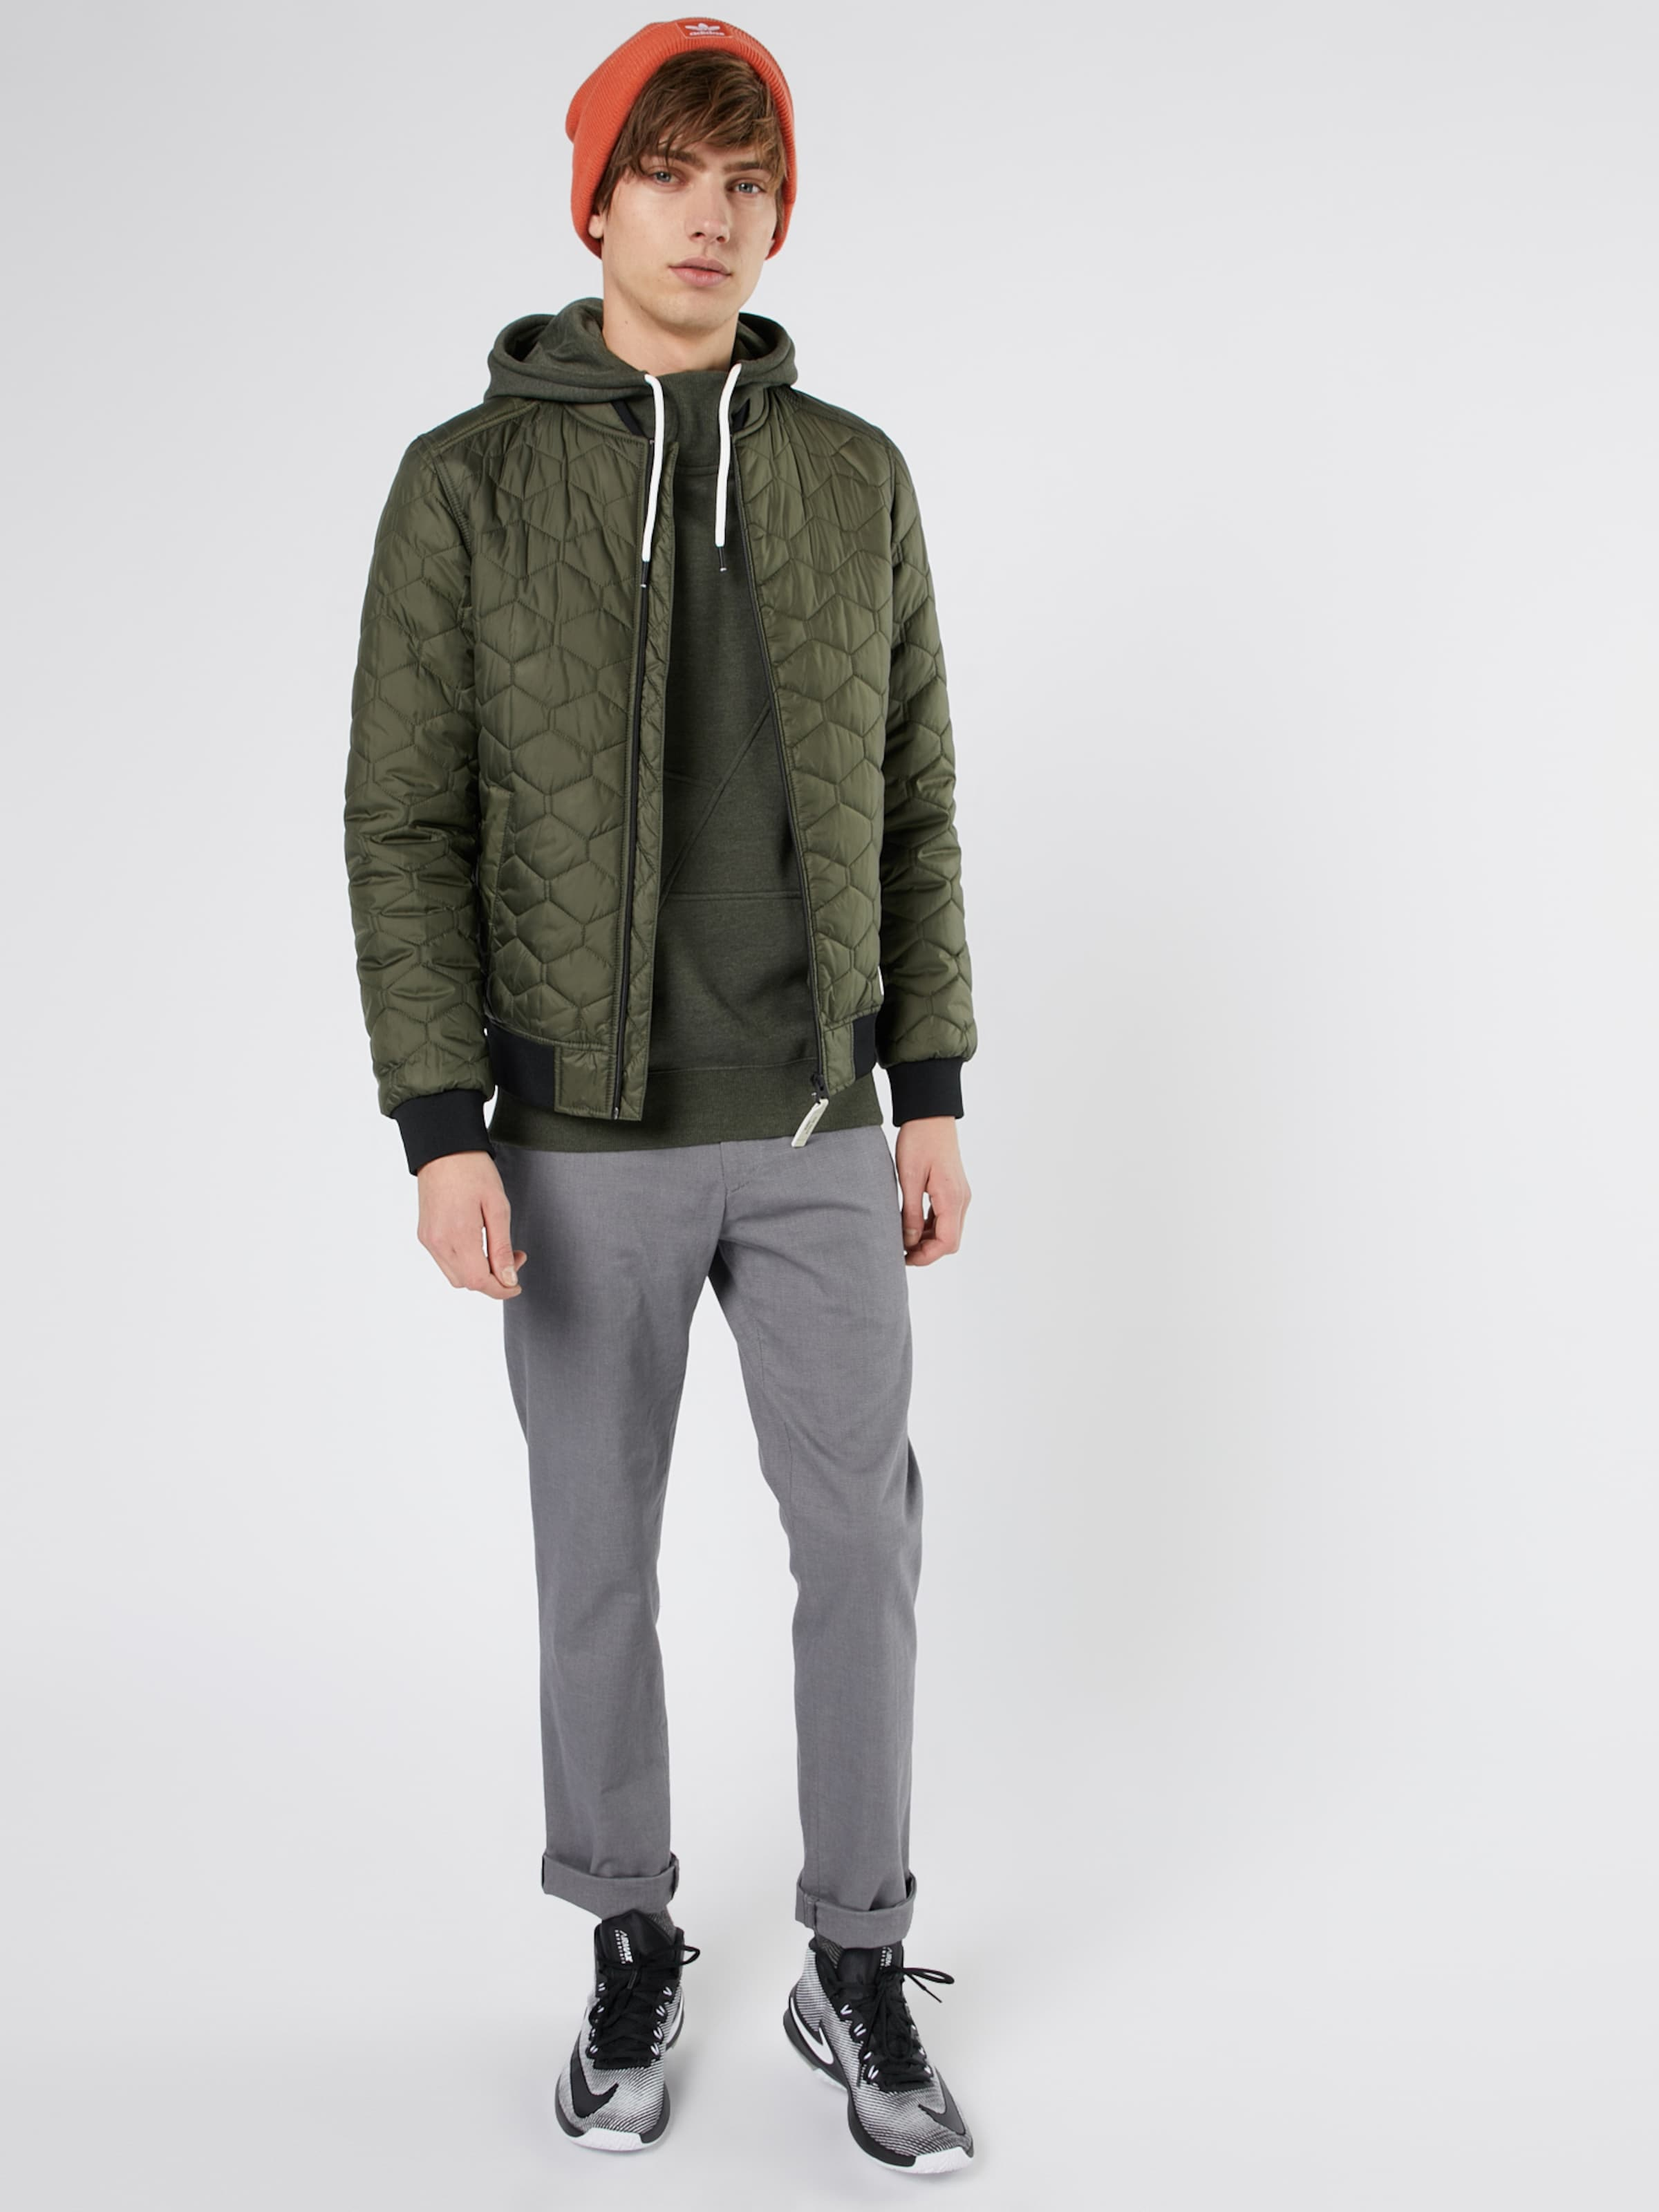 Sweater Sweat Dunkelgrün 'jcopinn Jones In Jackamp; Noos' Hood TFcuK1Jl53